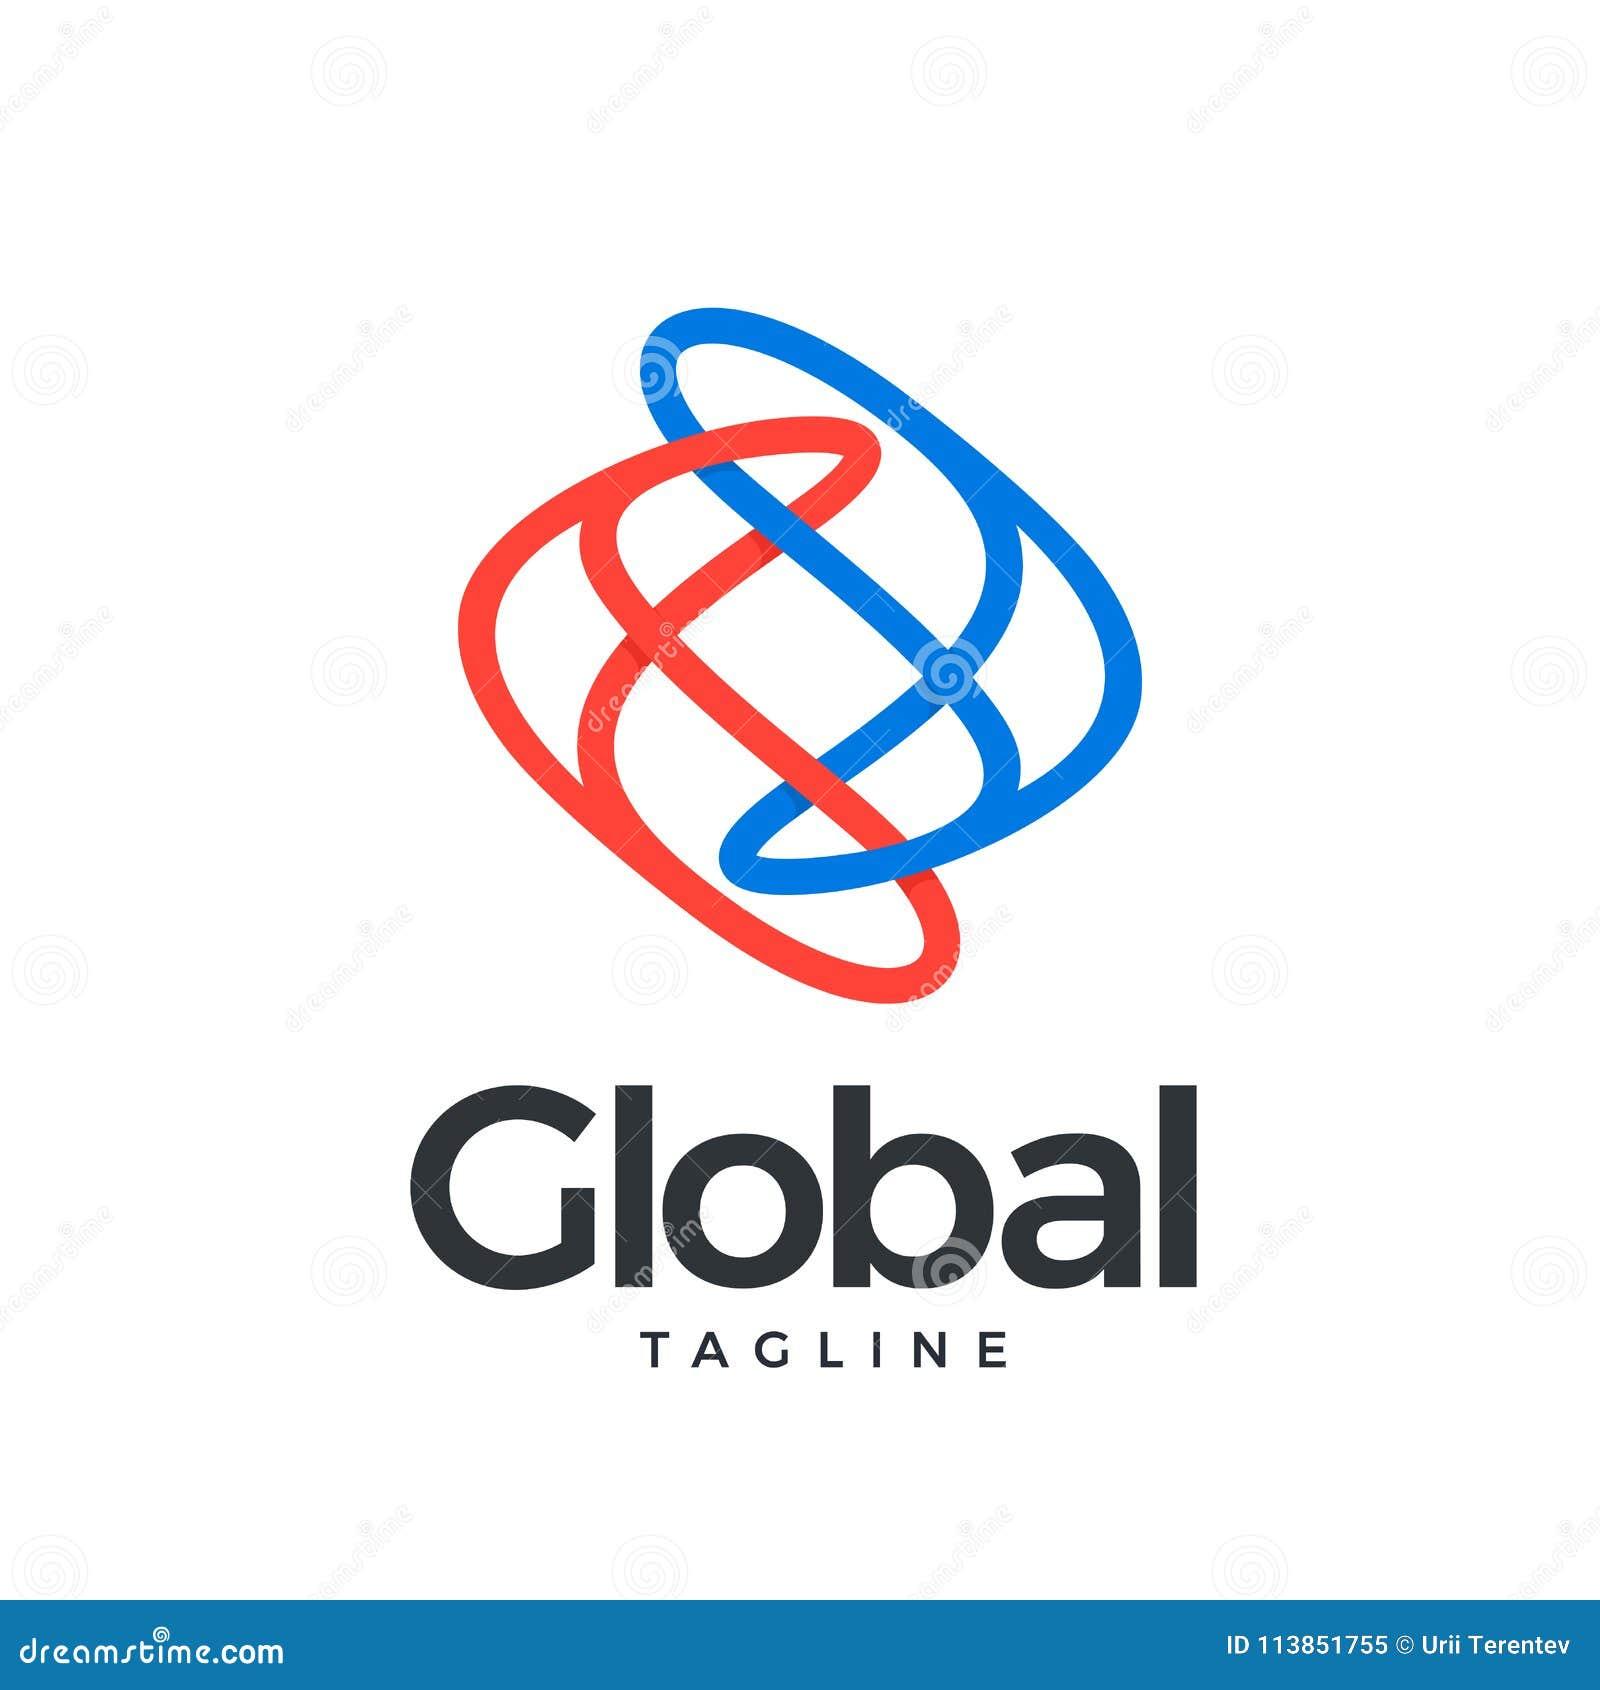 Ícone global na cor azul e vermelha